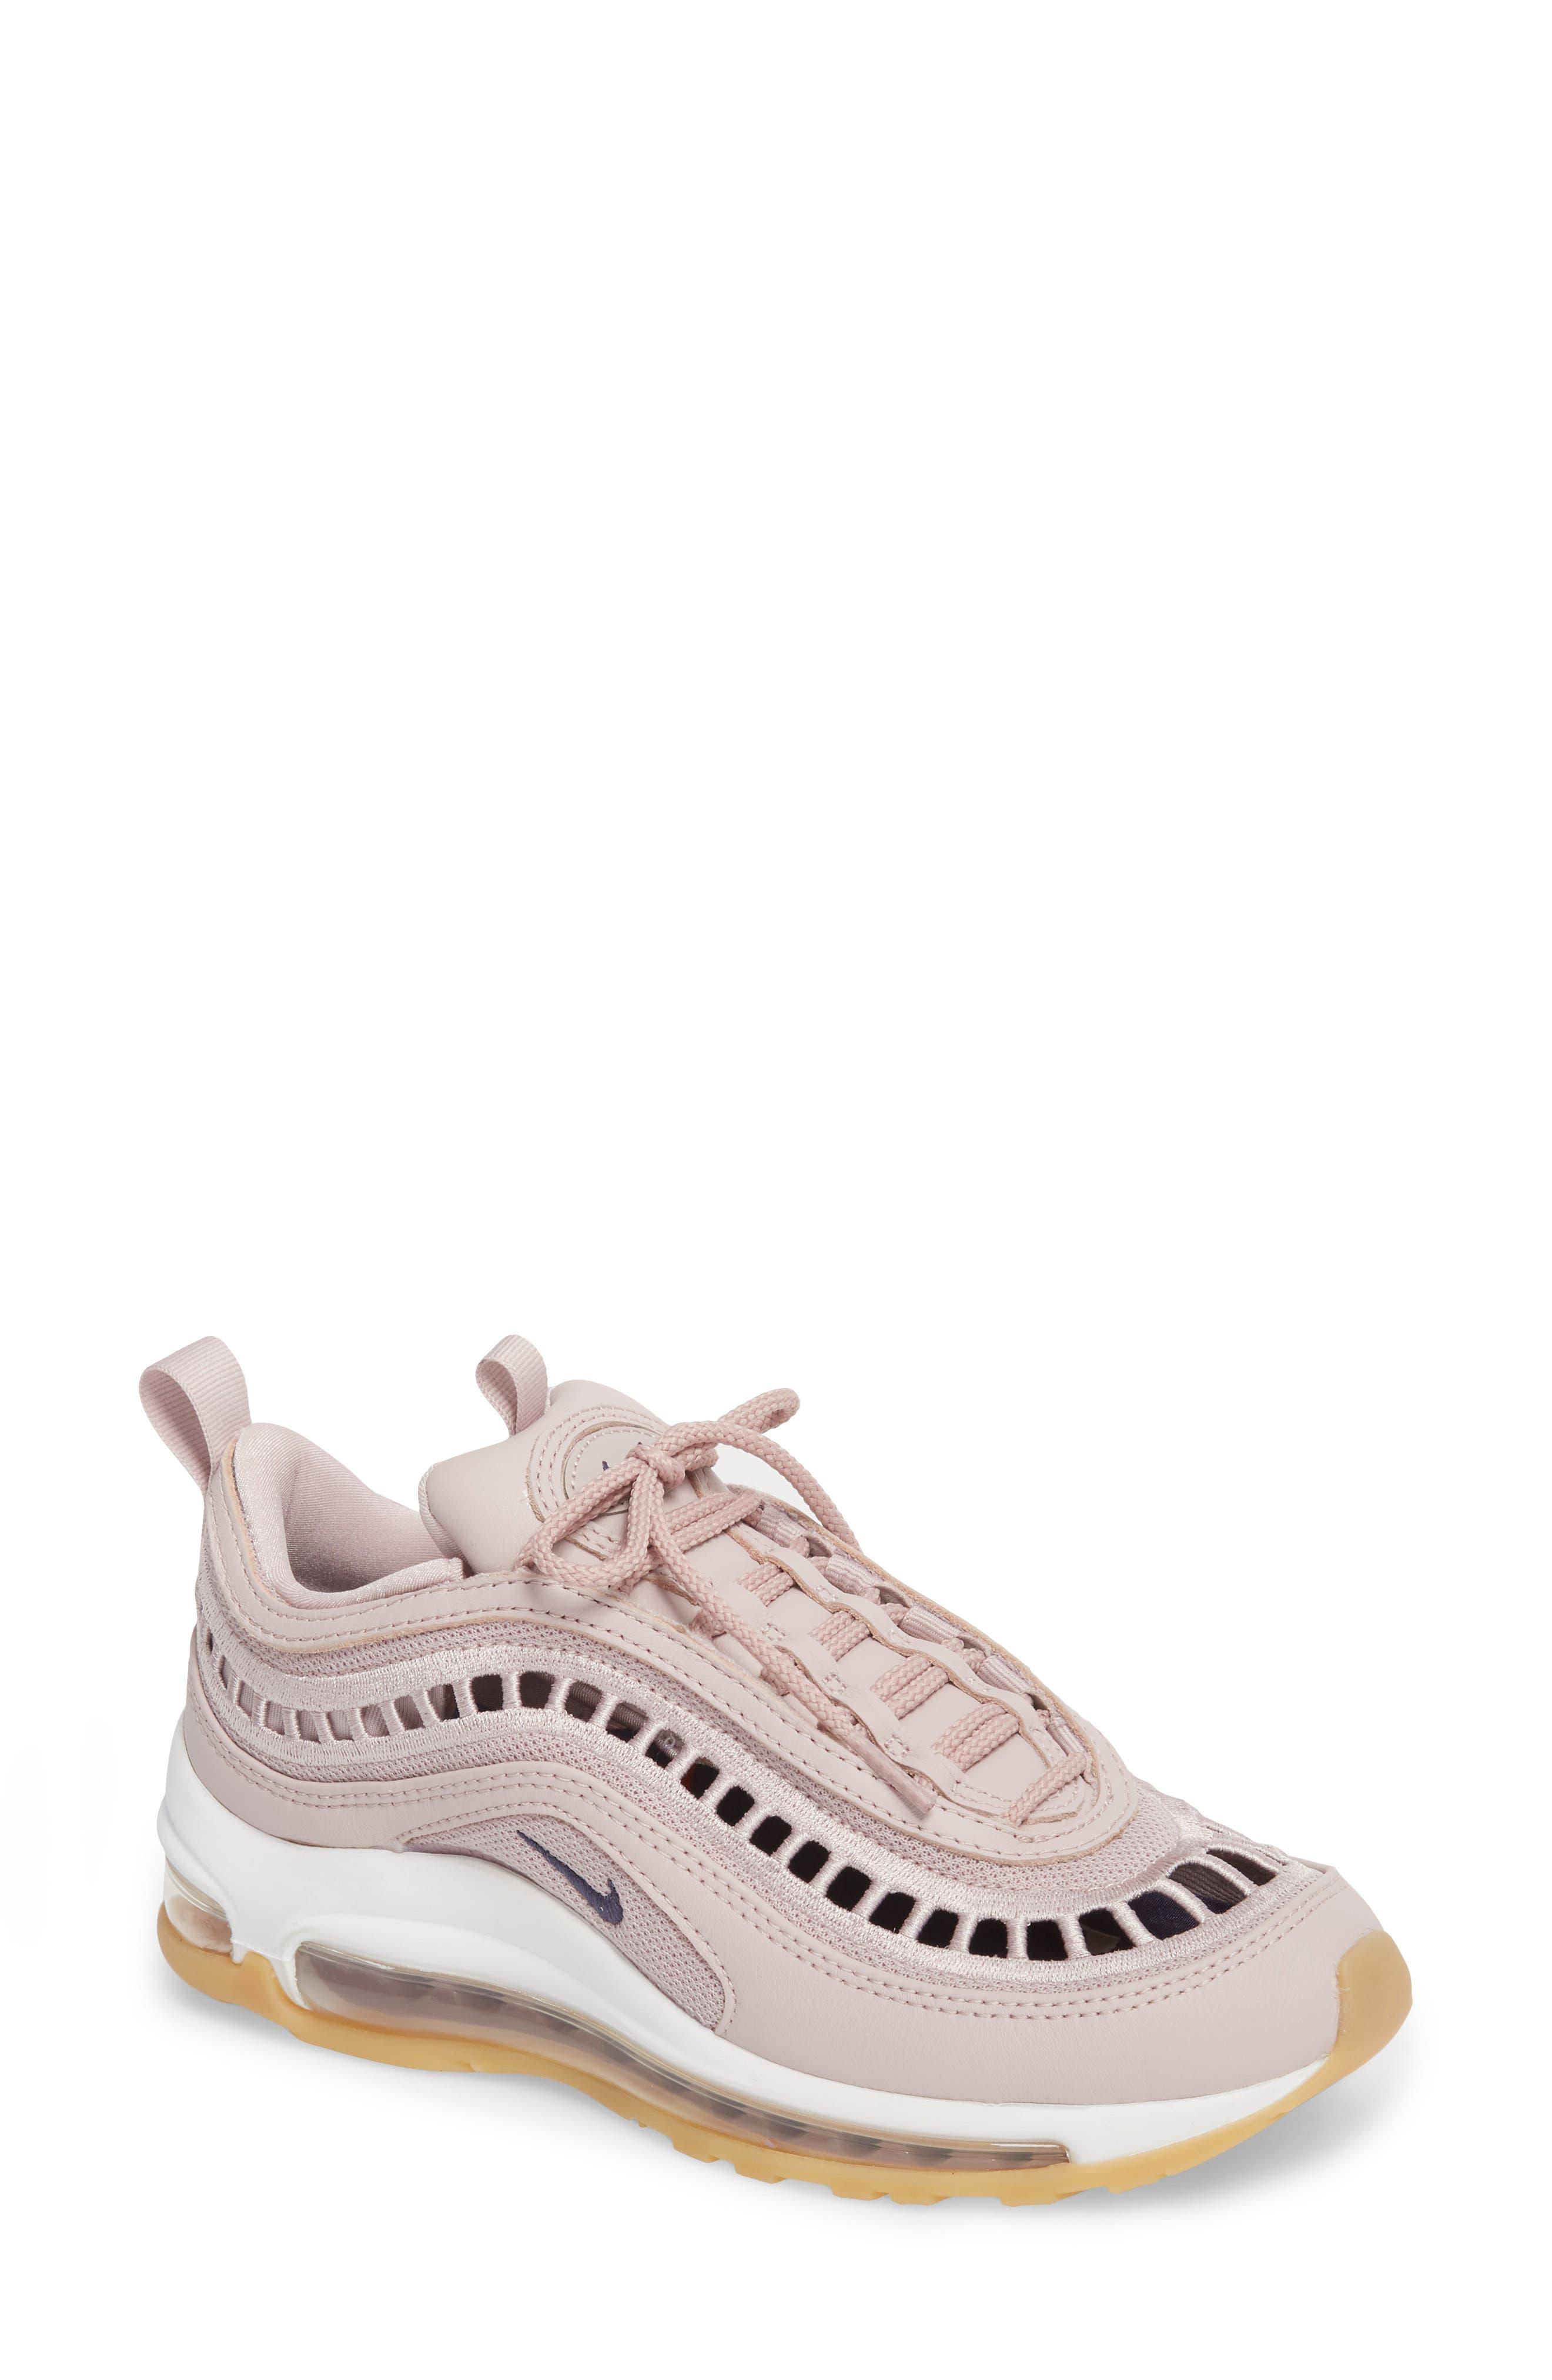 Air Max 97 Ultra '17 SI Sneaker,                         Main,                         color, Particle Rose/ Neutral Indigo